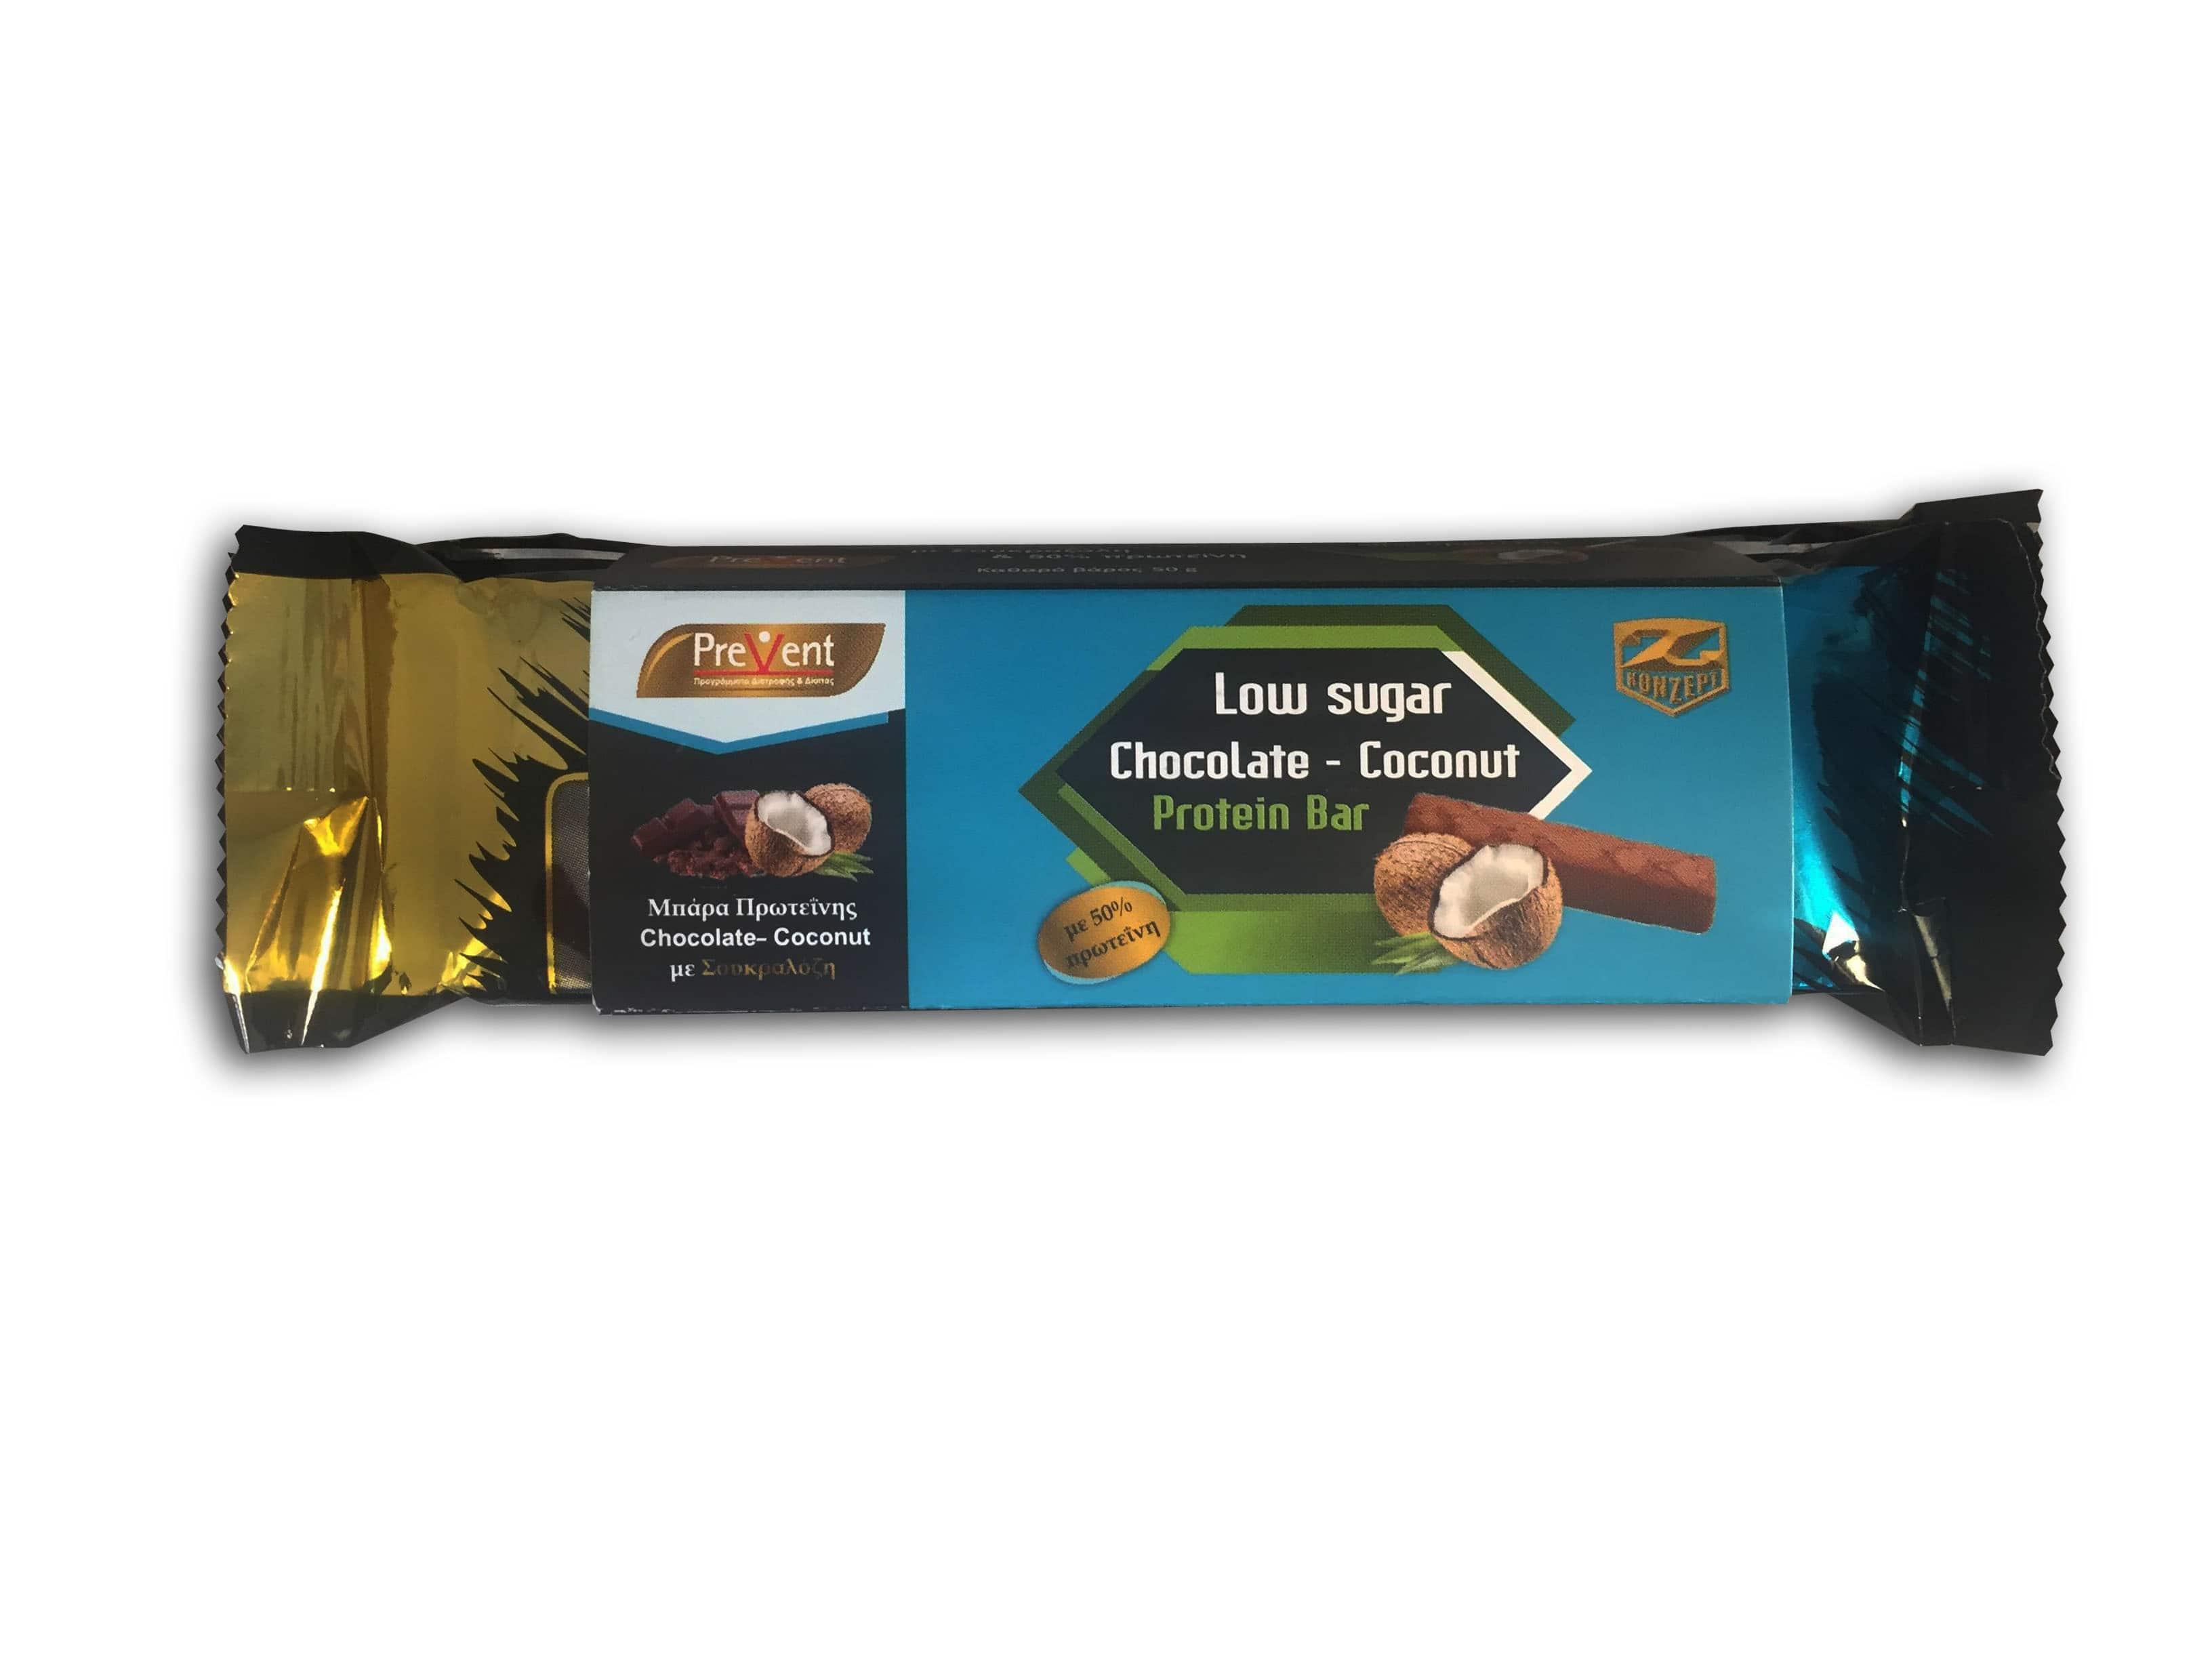 3 x Prevent Z-Konzept Protein Bar 50% Chocolate Coconut Πρωτεϊνική Μπάρα, με γεύση Σοκολάτα - Ινδοκάρυδο, 3 x 50gr